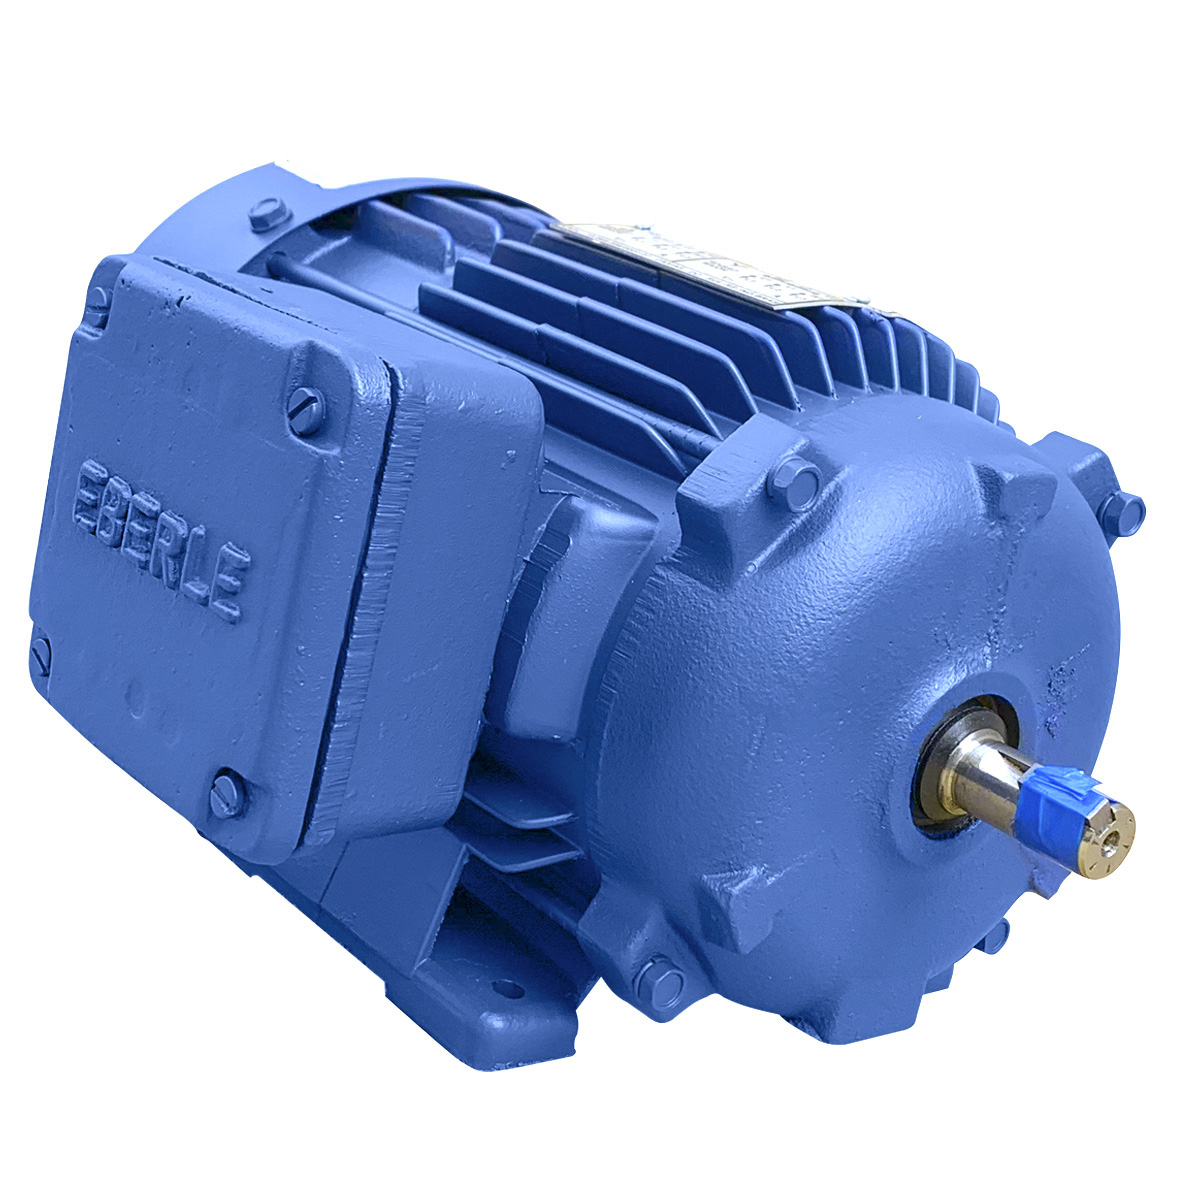 Motor Elétrico Trifásico 0,75cv 4 Polos 4 Tensões Baixa Rotação 3/4 Hp Eberle Mercosul